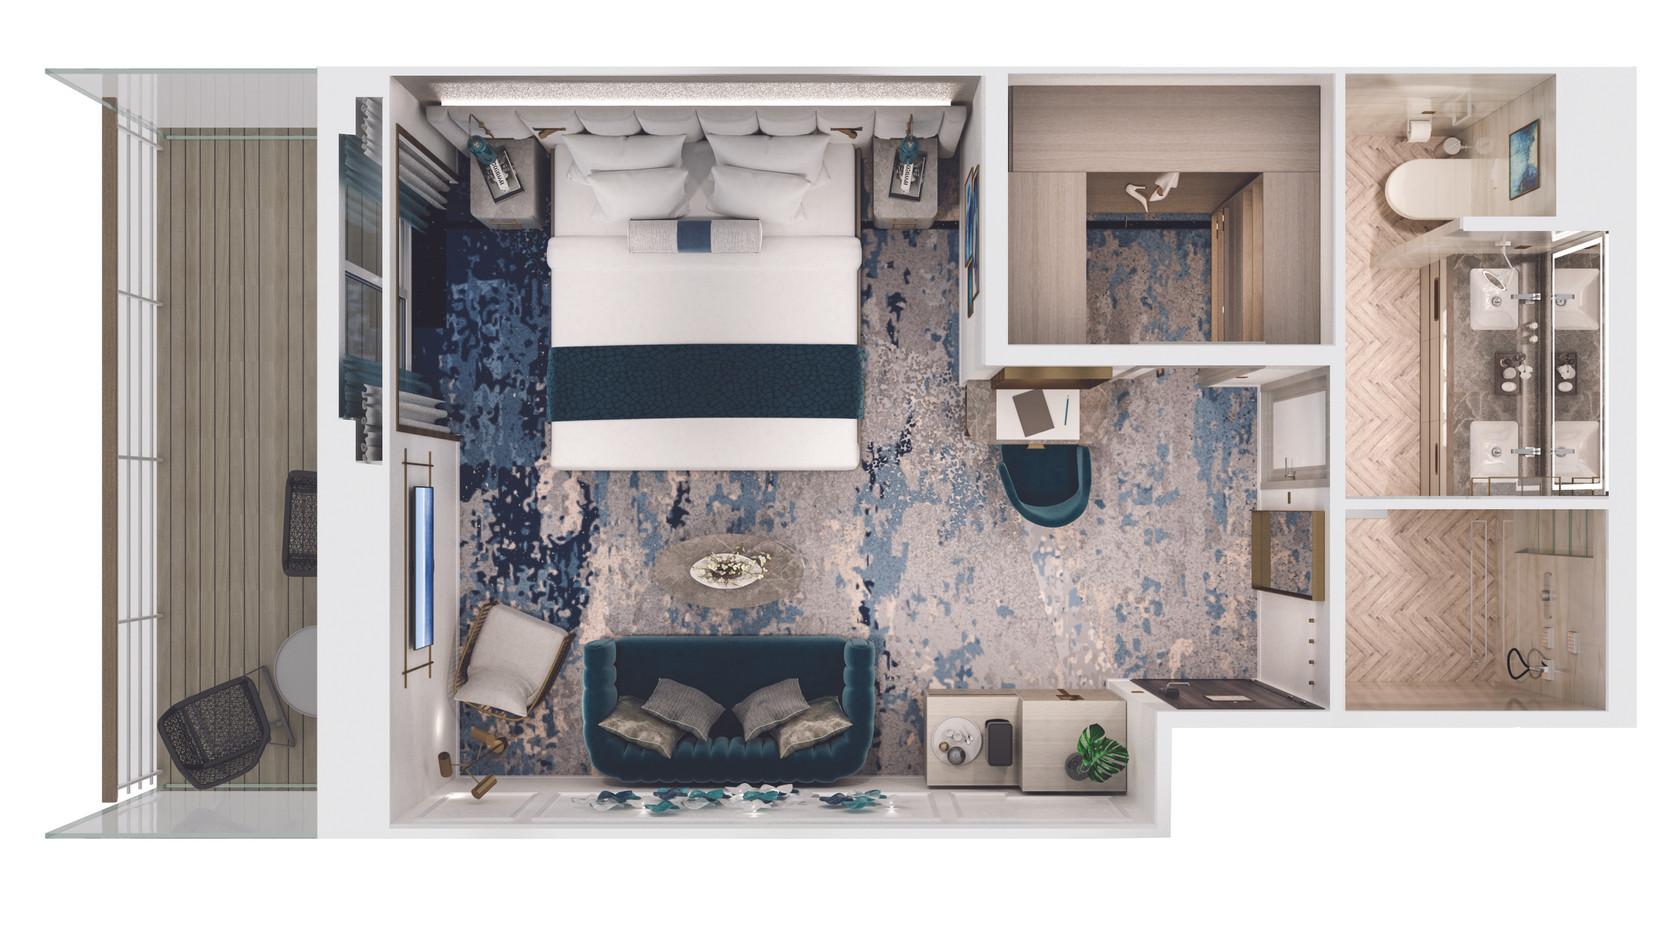 Seabreeze Penthouse with Verandah (SH) Layout